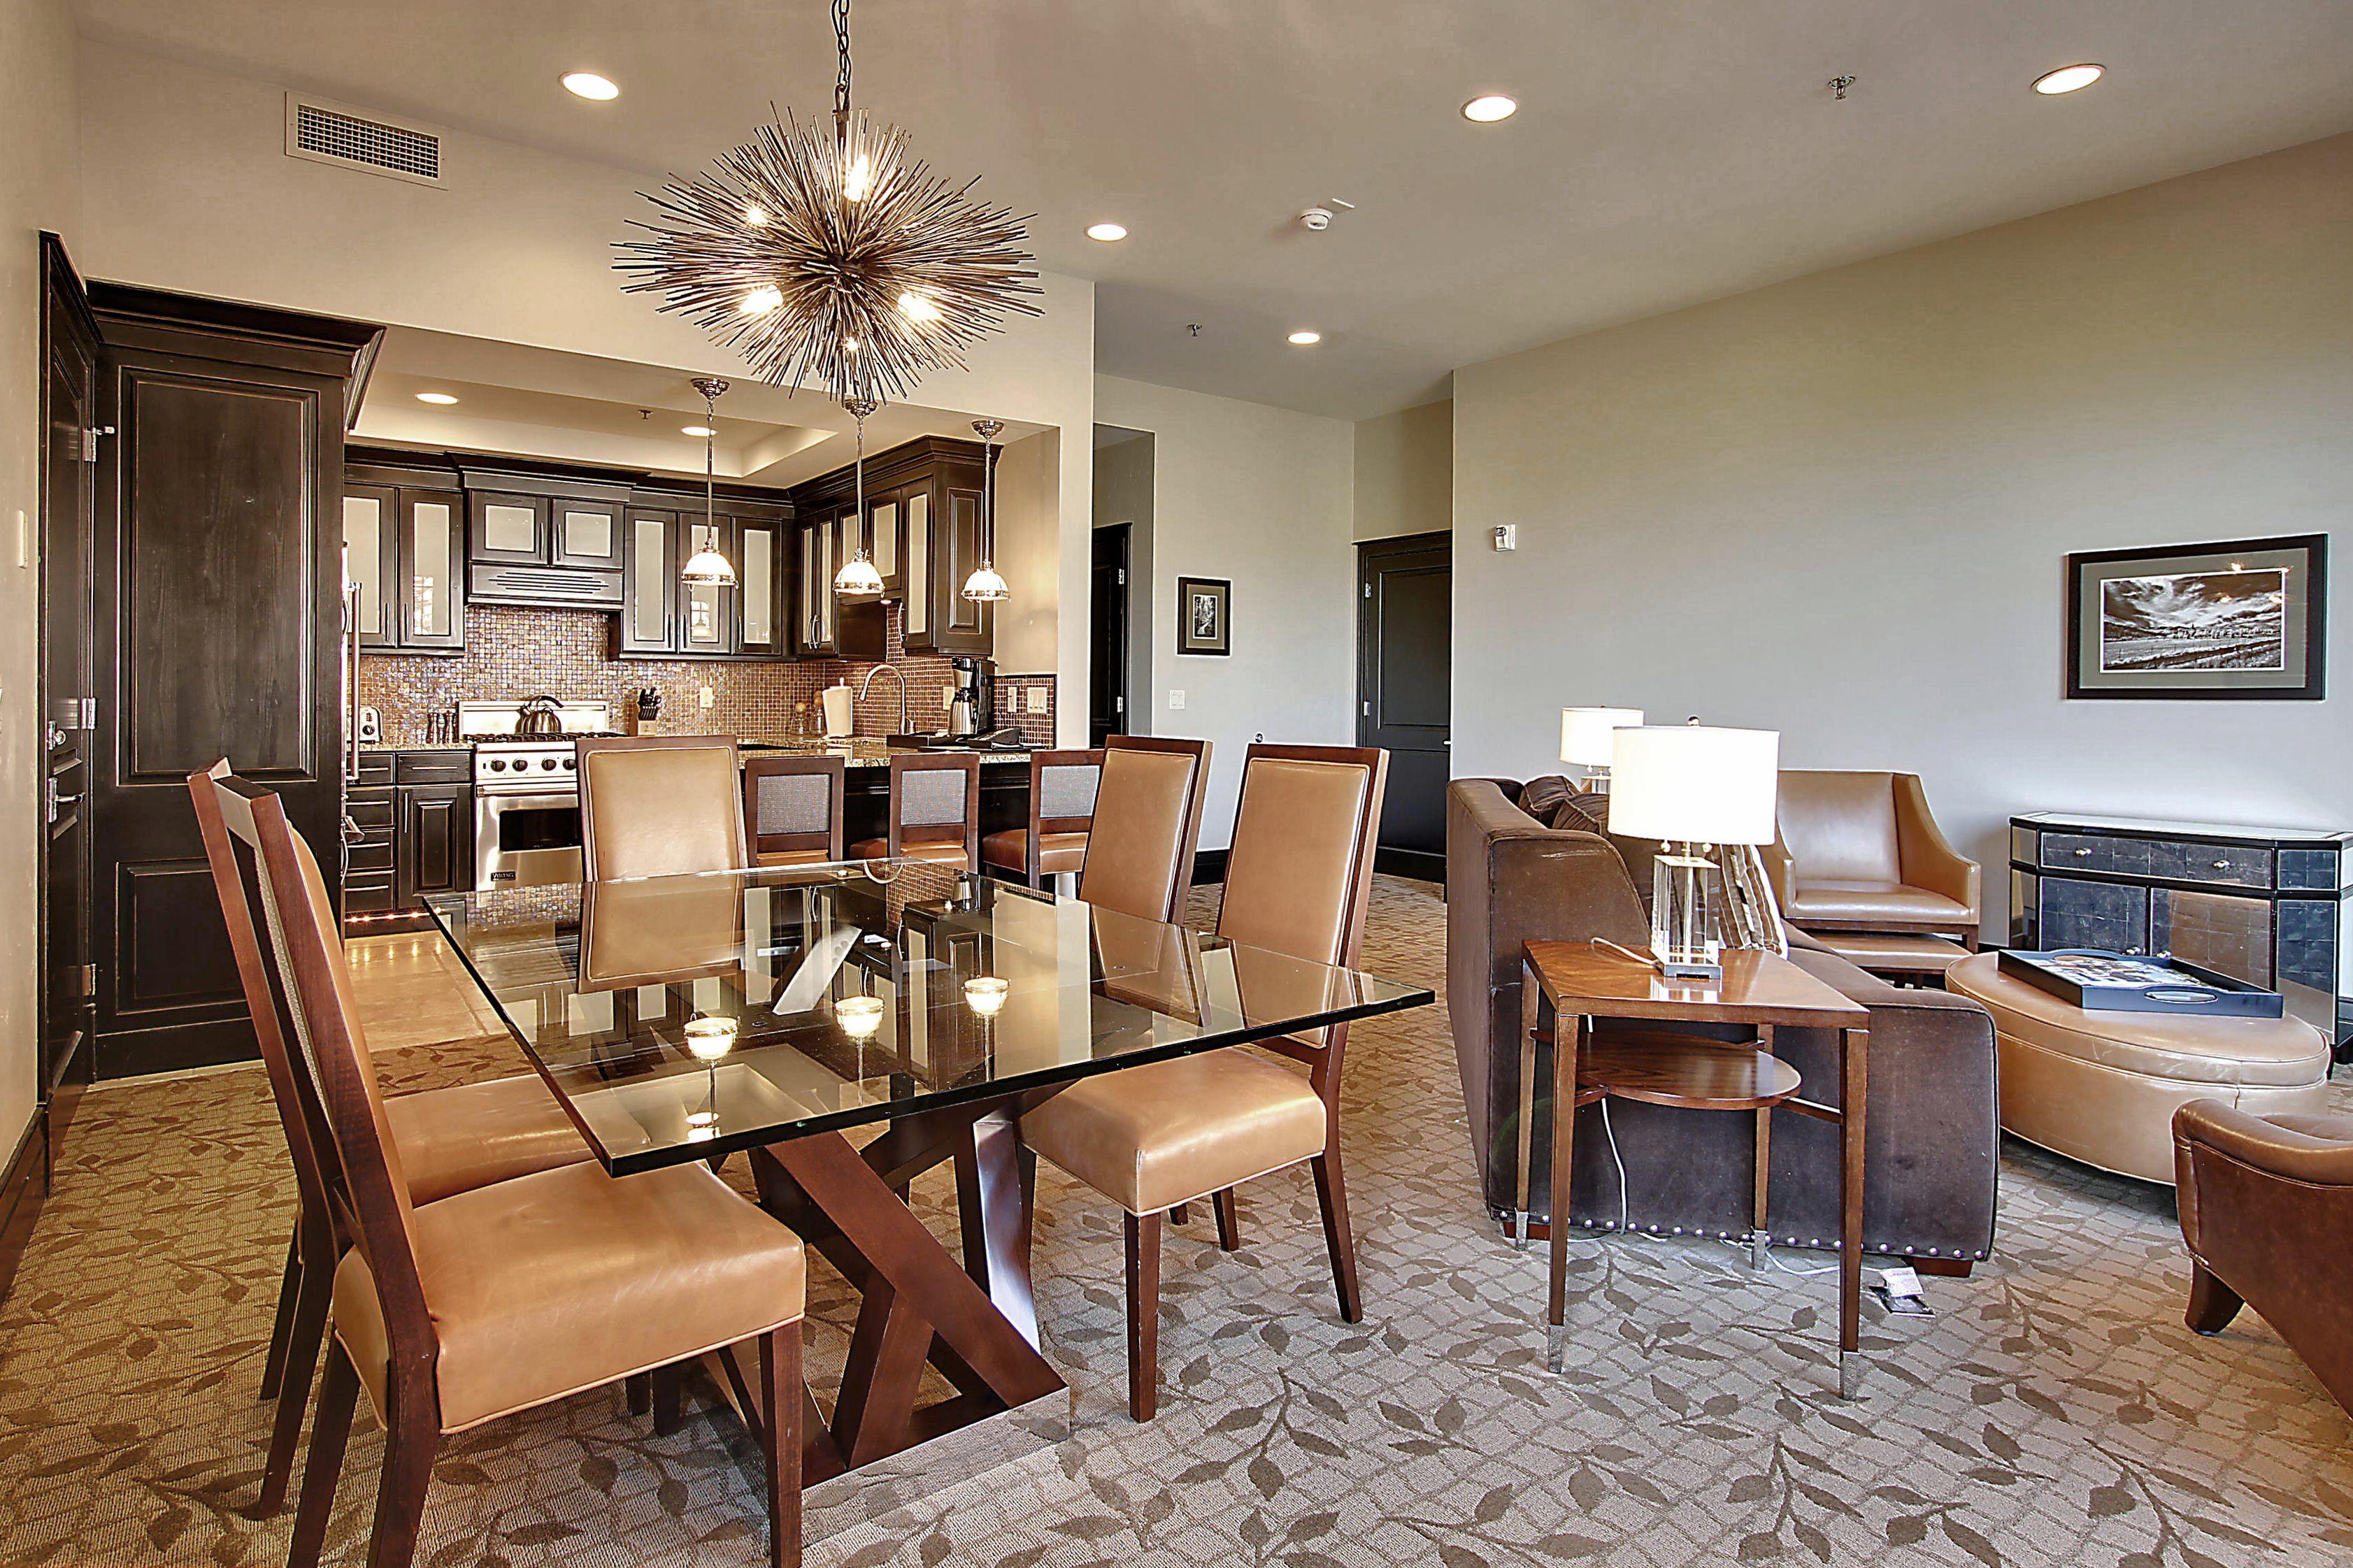 5 Star Luxury Hotel Residence Opulence 2 Bedroom Suite